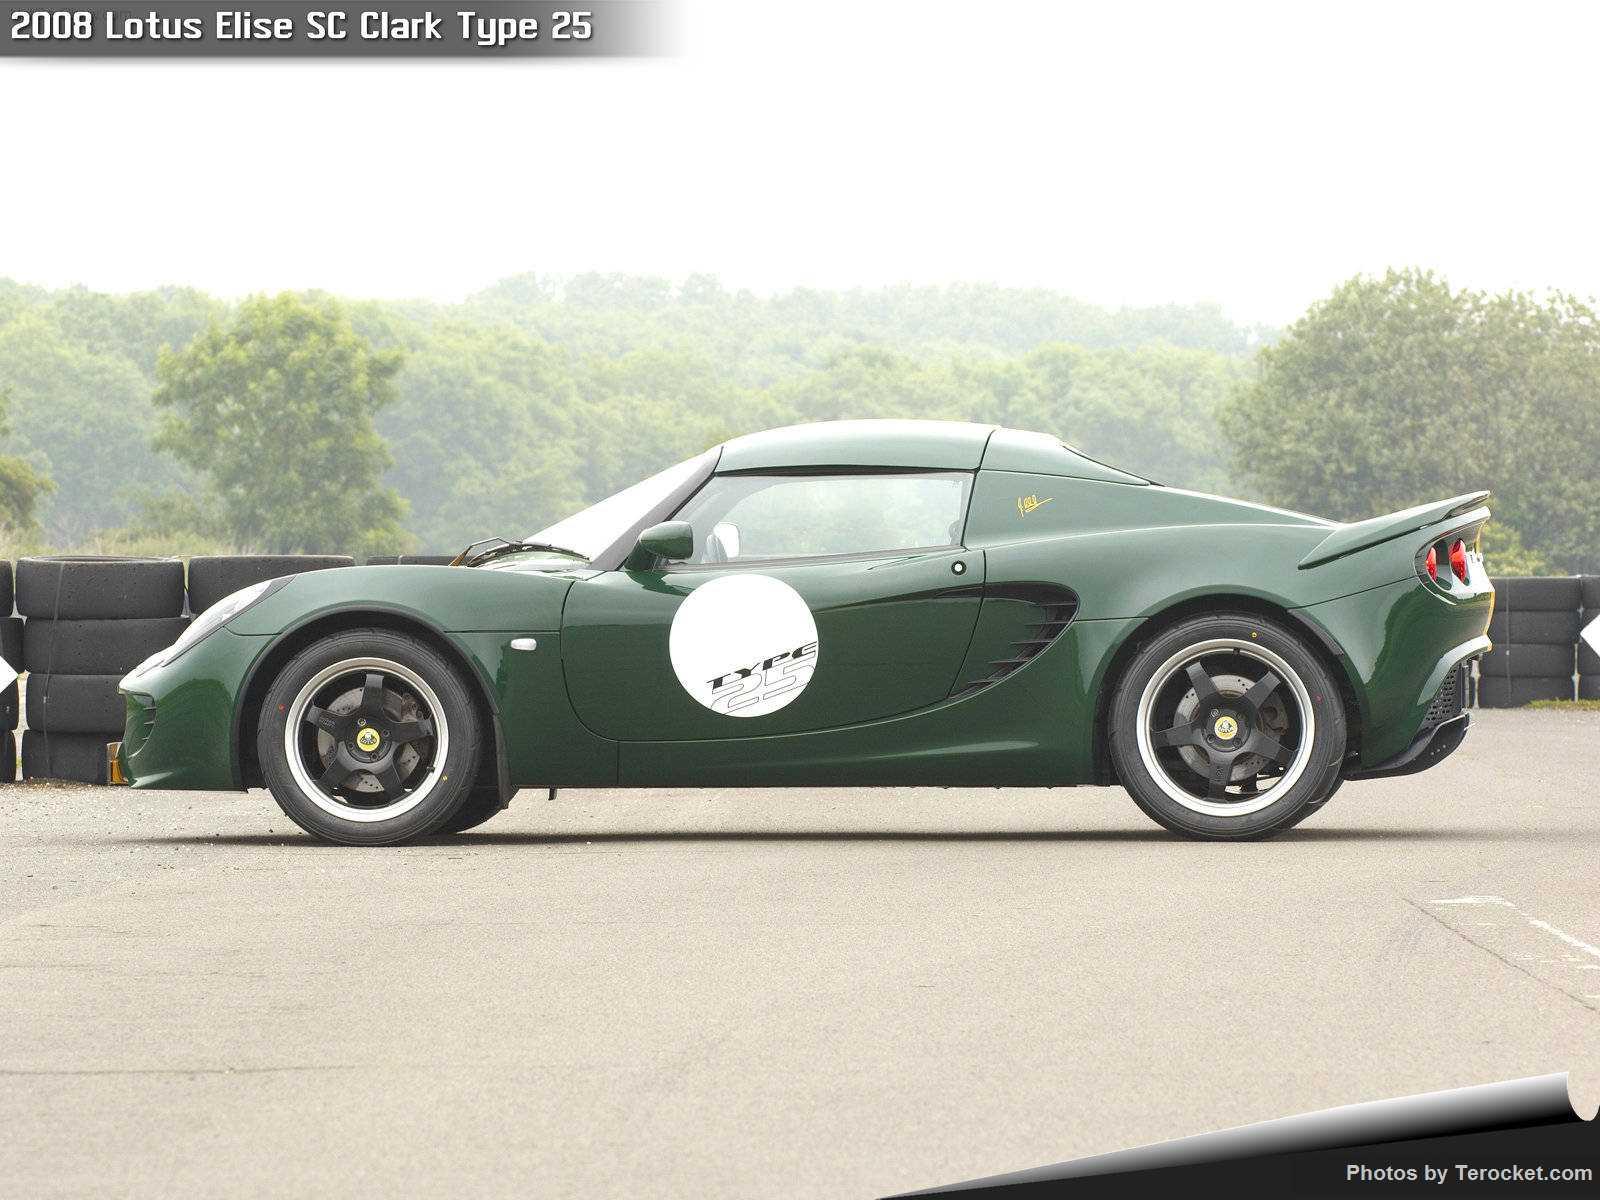 Hình ảnh siêu xe Lotus Elise SC Clark Type 25 2008 & nội ngoại thất